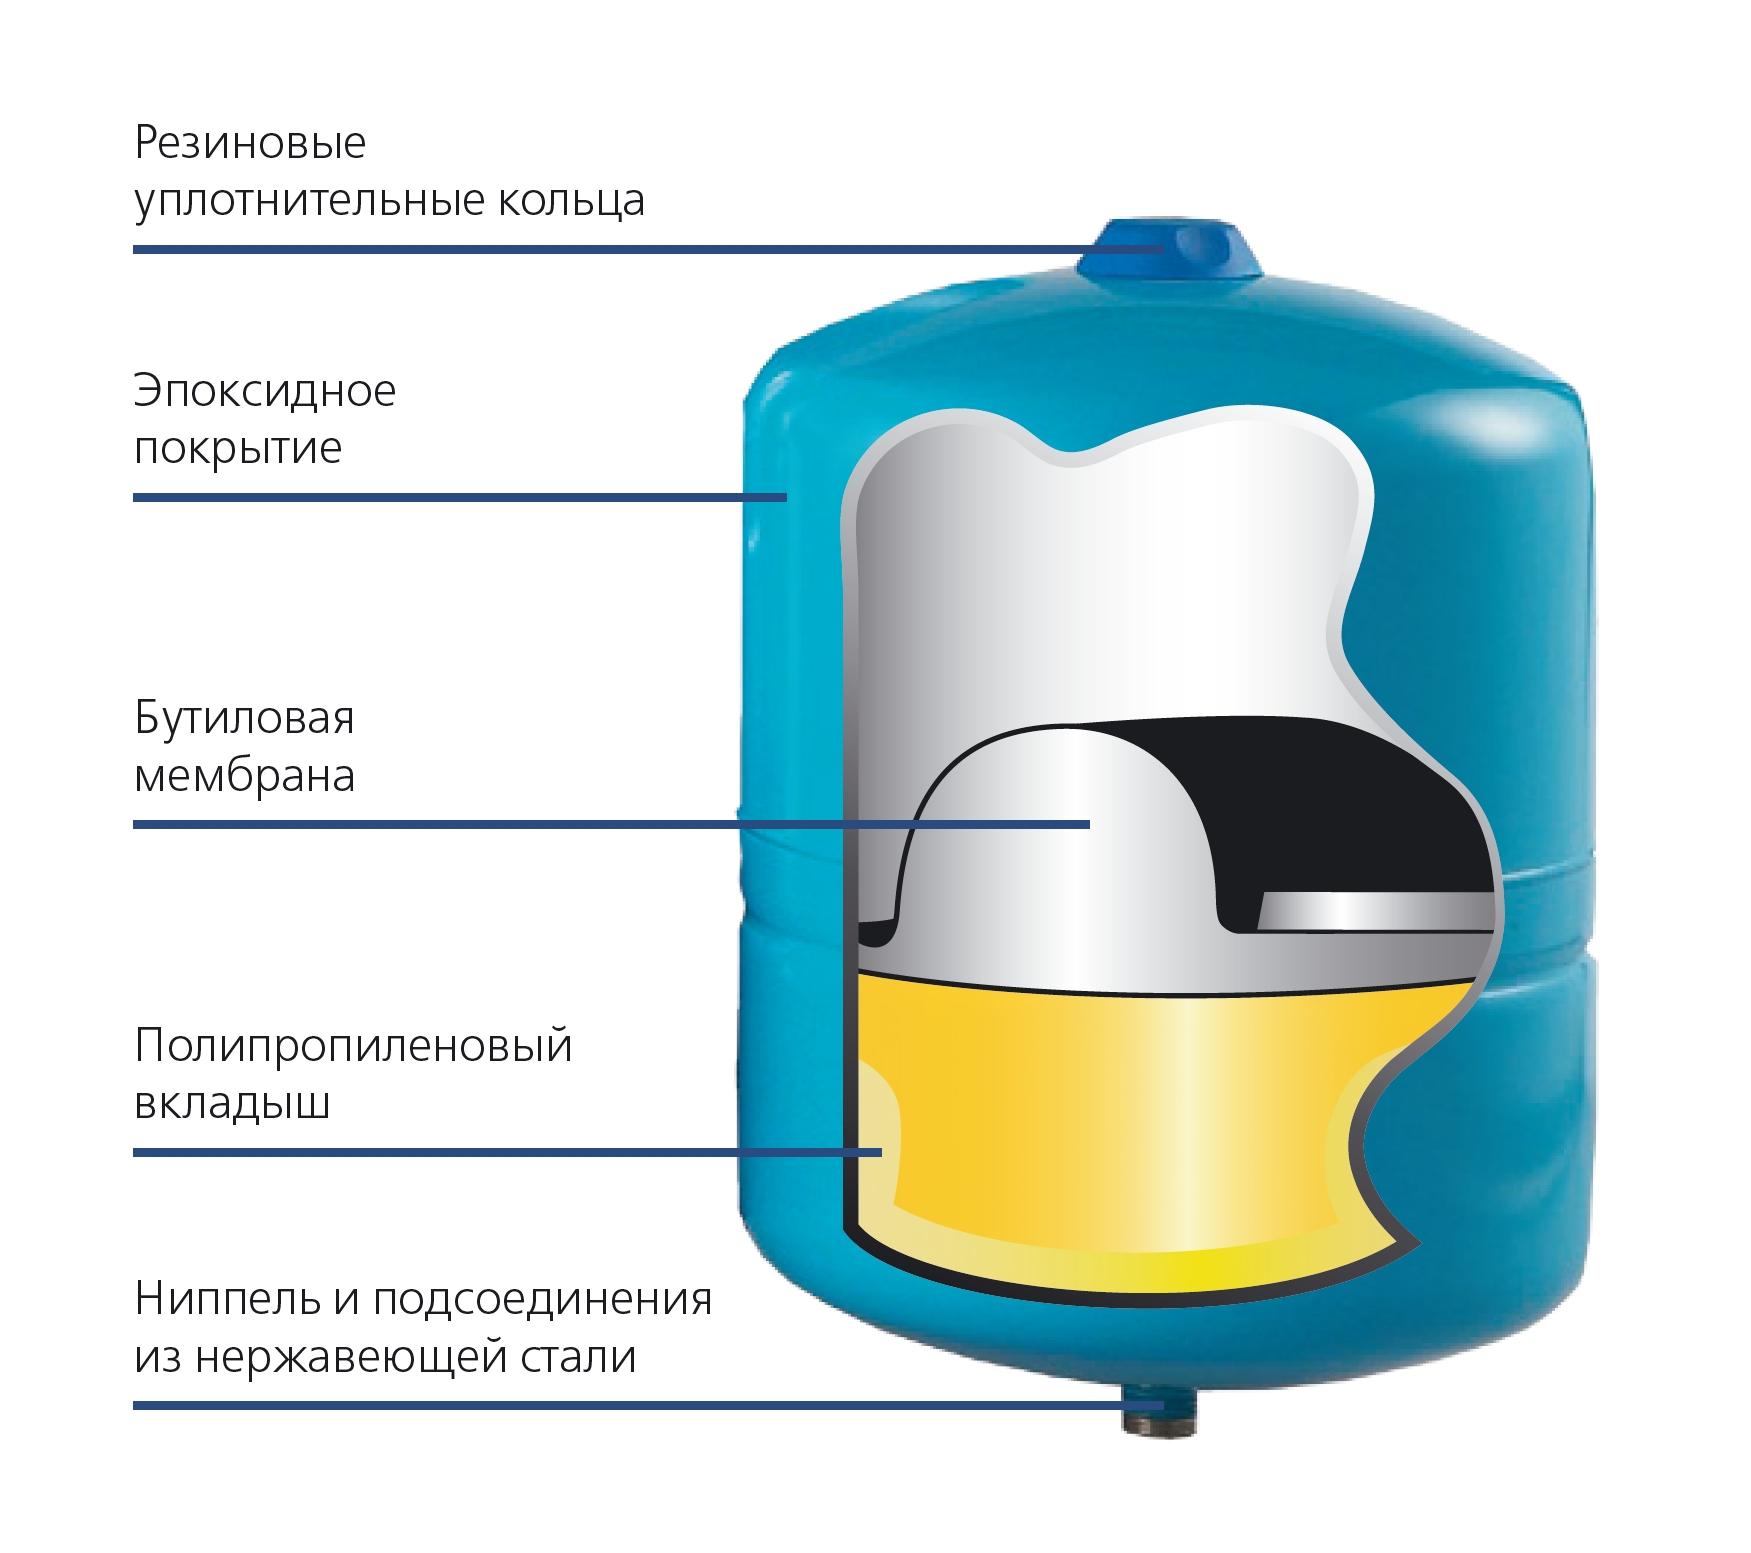 Экспанзоматы с пневматическим накопителем